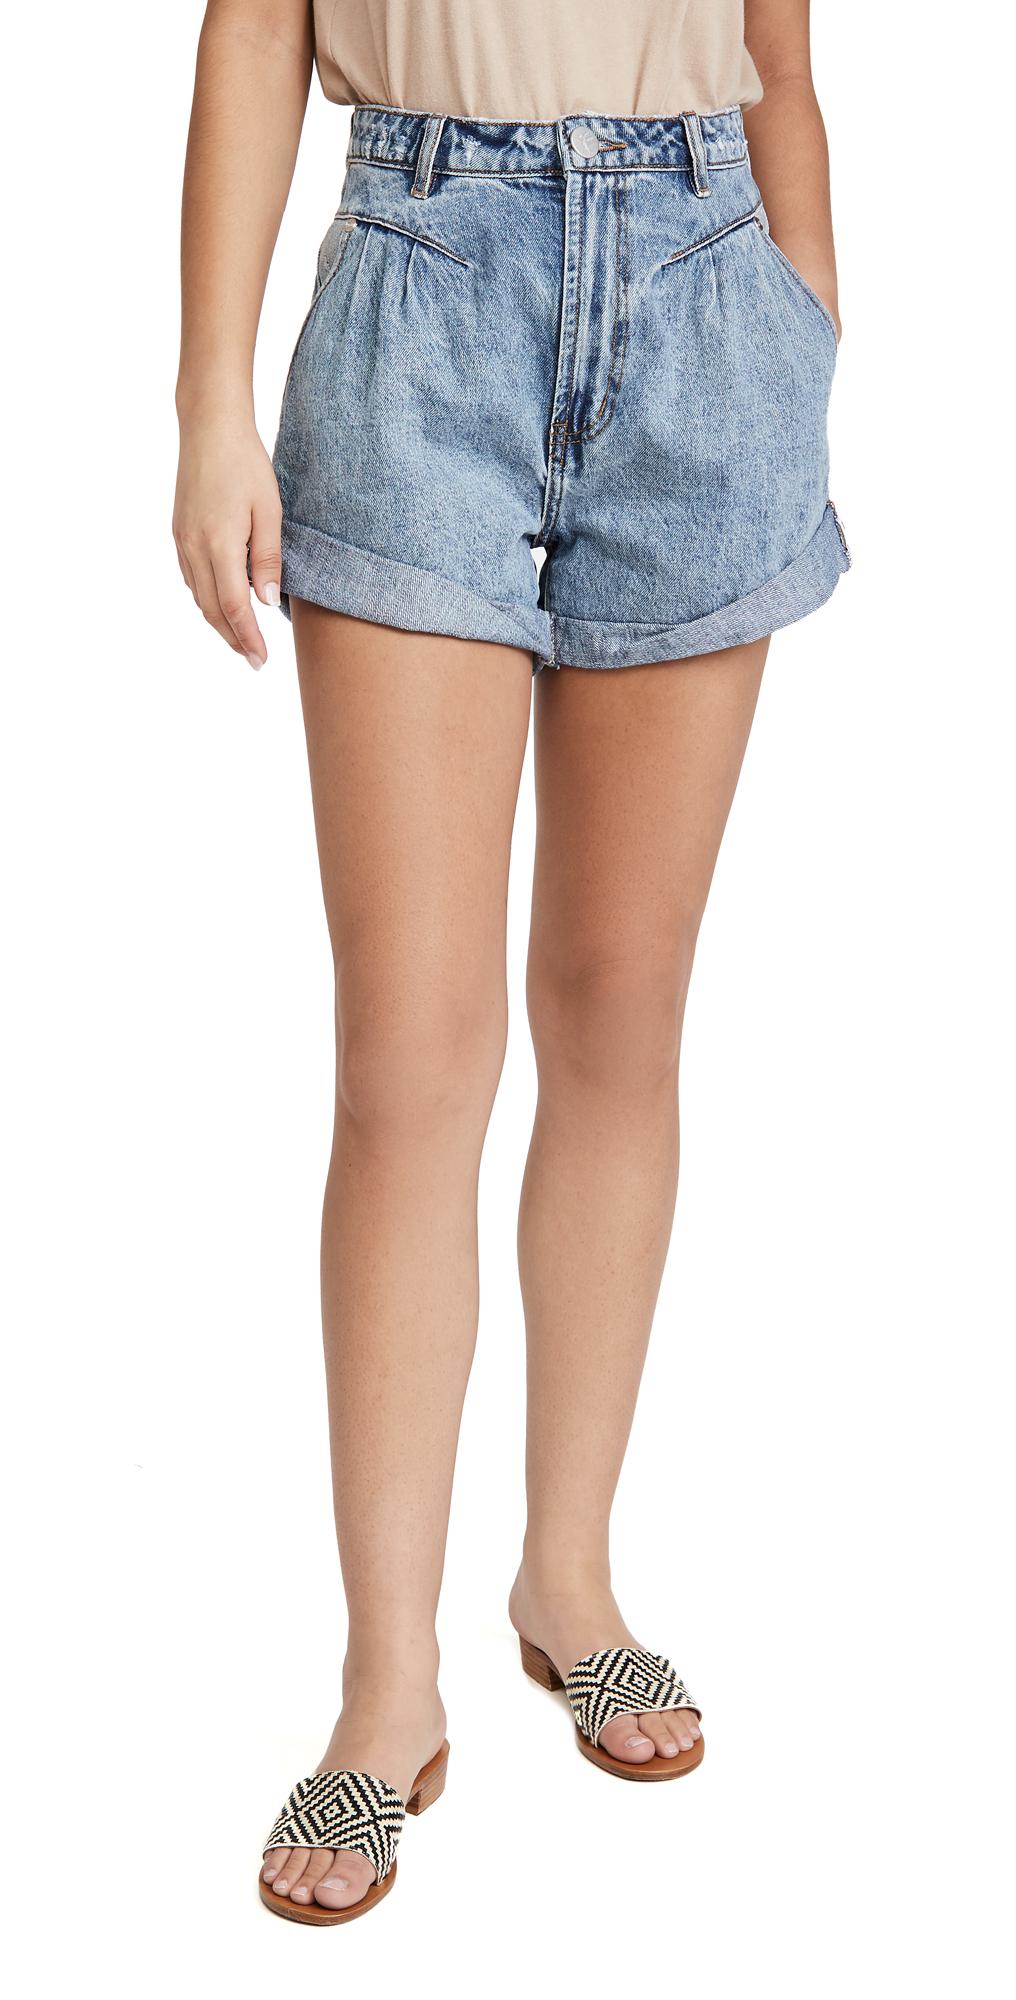 One Teaspoon Venice Streetwalkers High Waist 80s Shorts